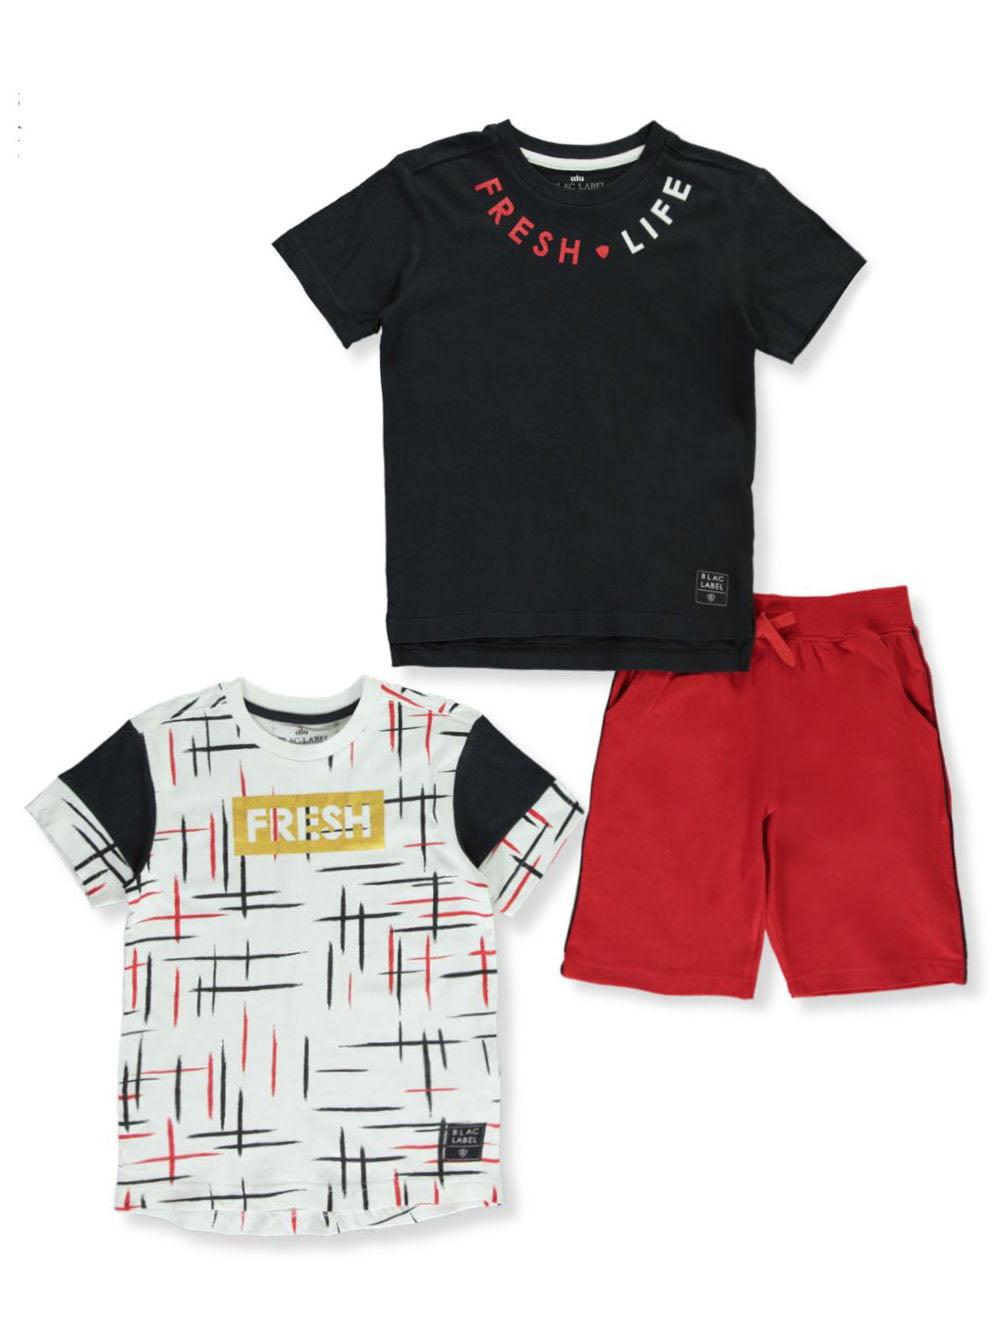 Blac Label Boys Drip 2-Piece Shorts Set Outfit